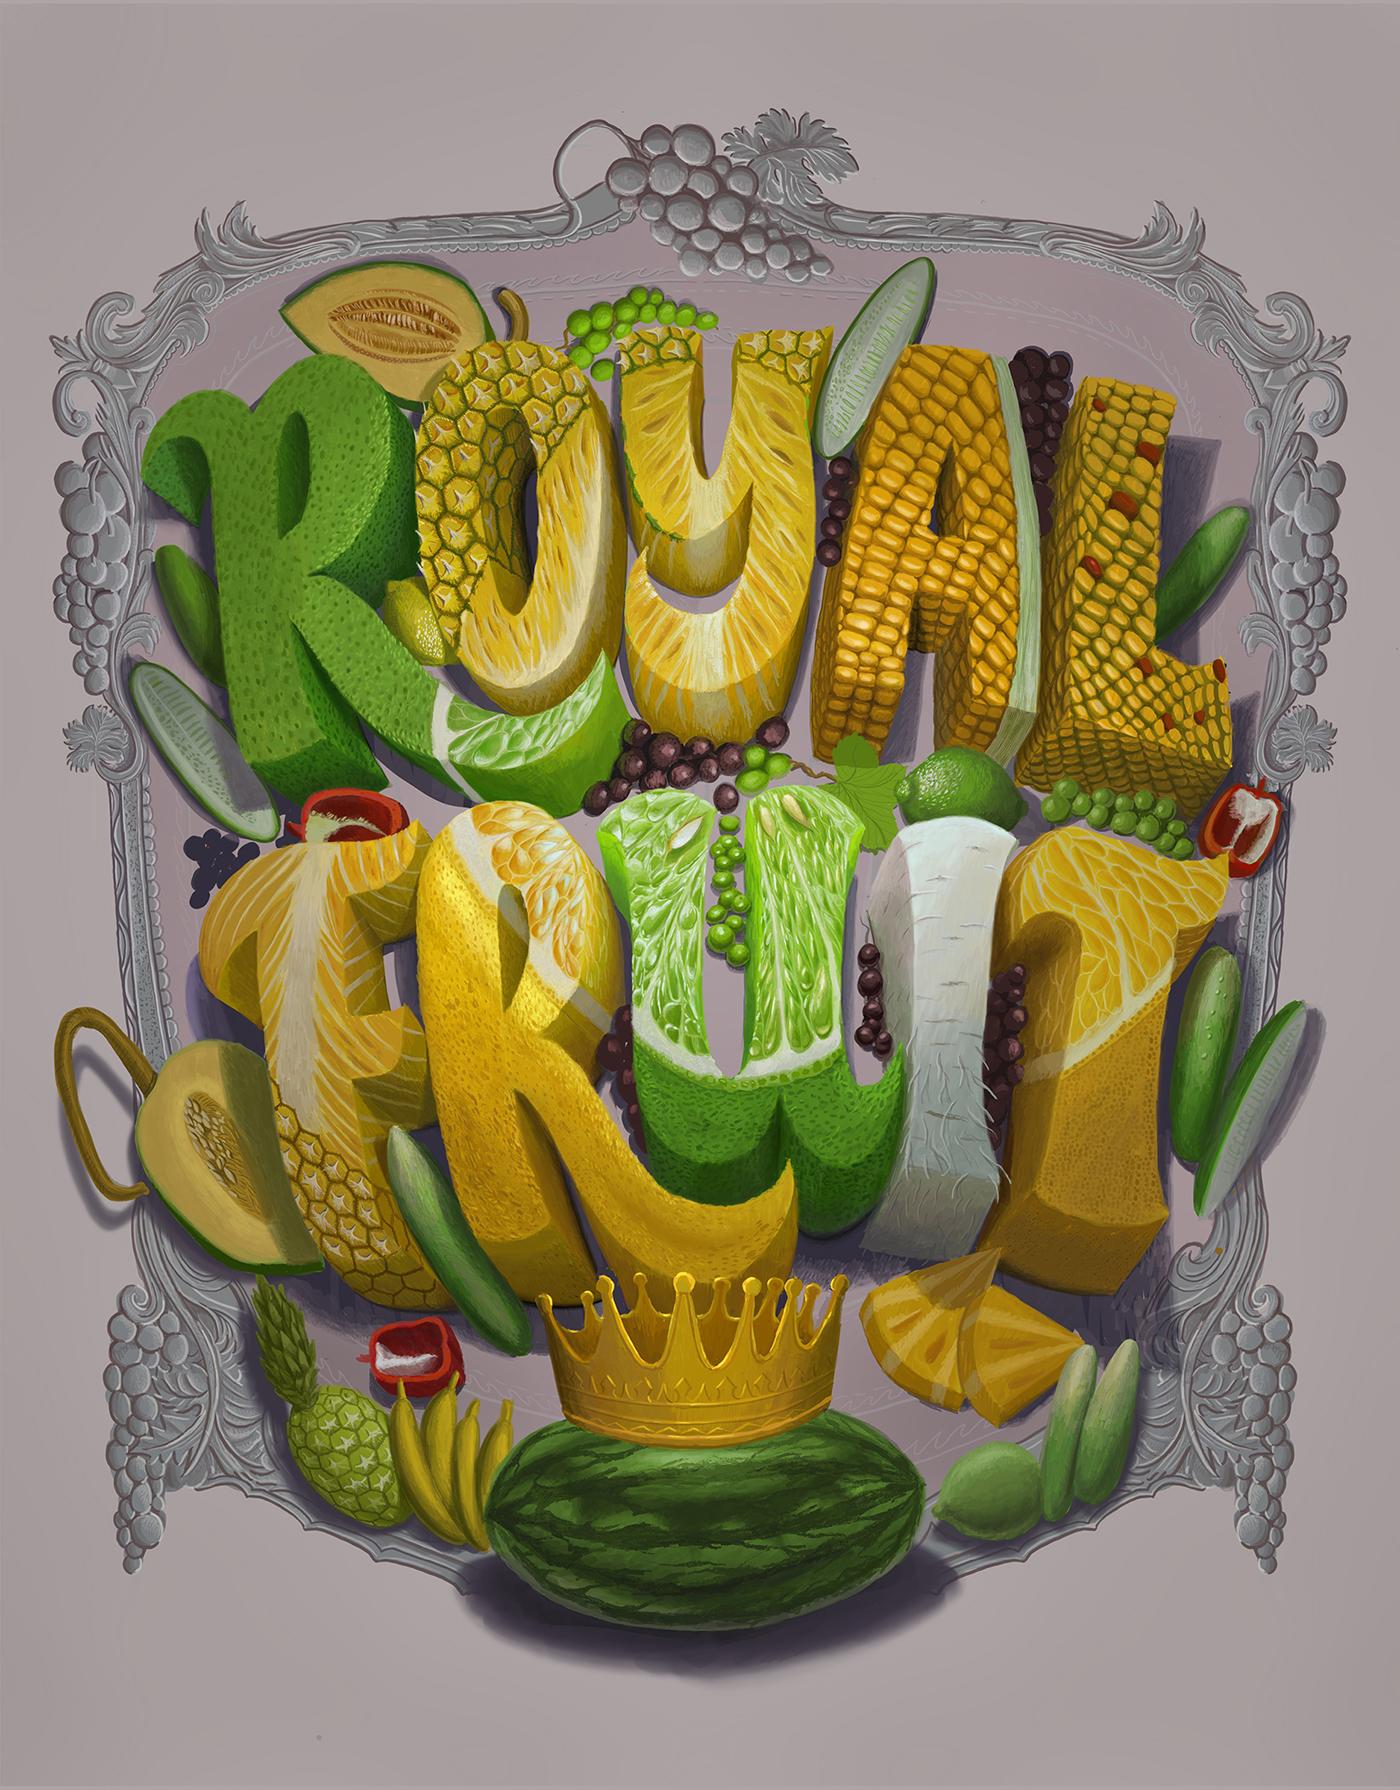 Royal food